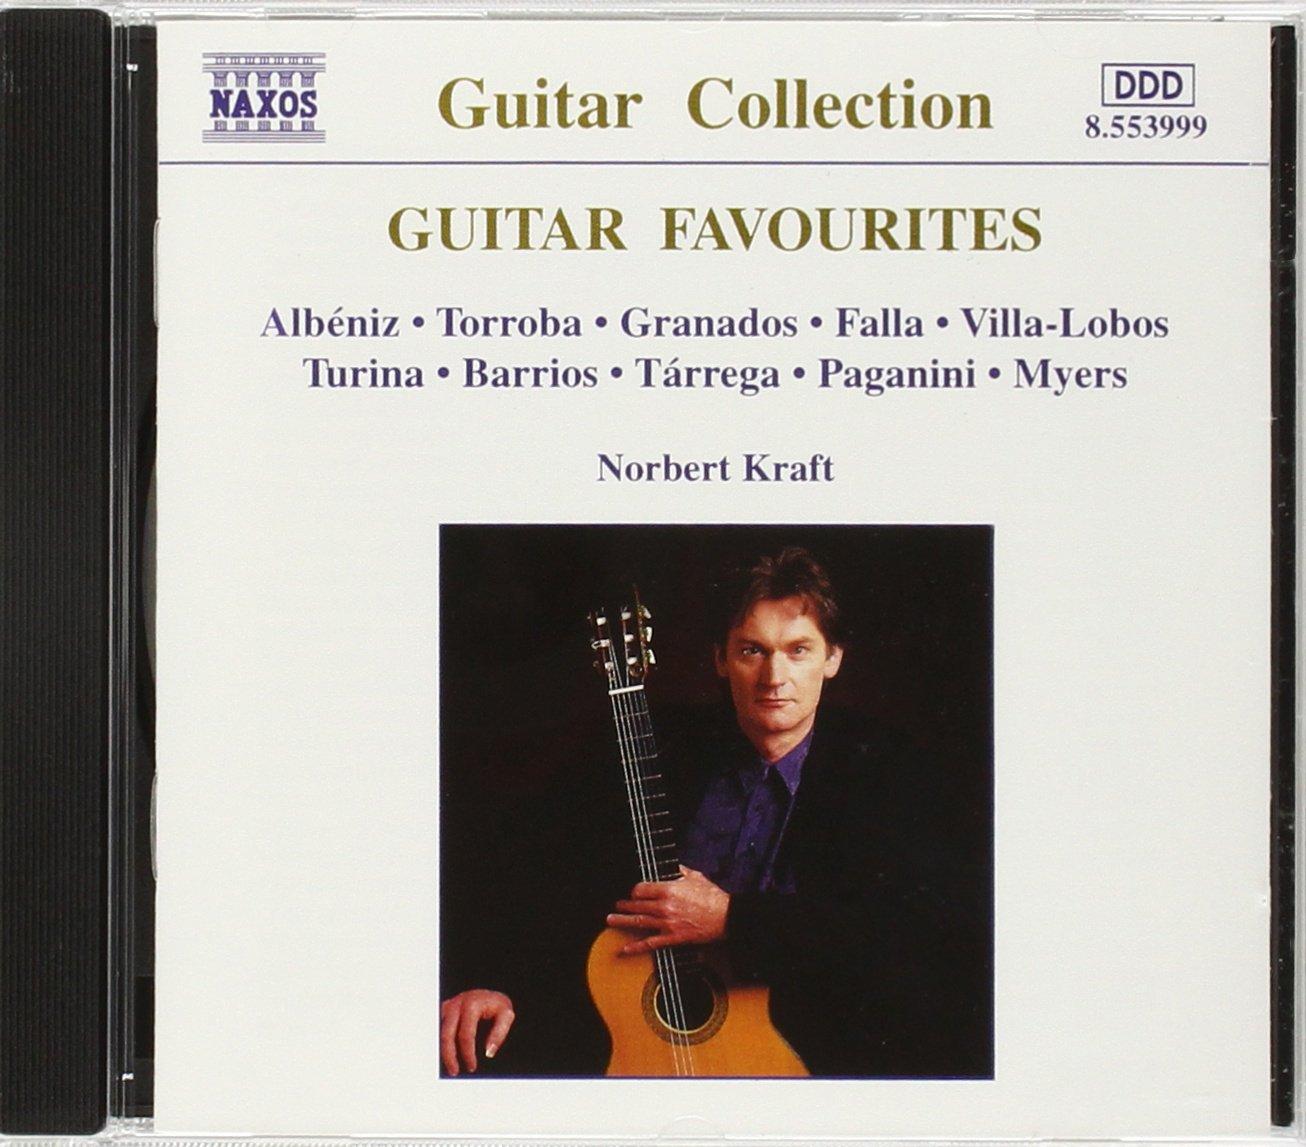 Obras Famosas Para Guitarra: Norbert Kraft: Amazon.es: Música